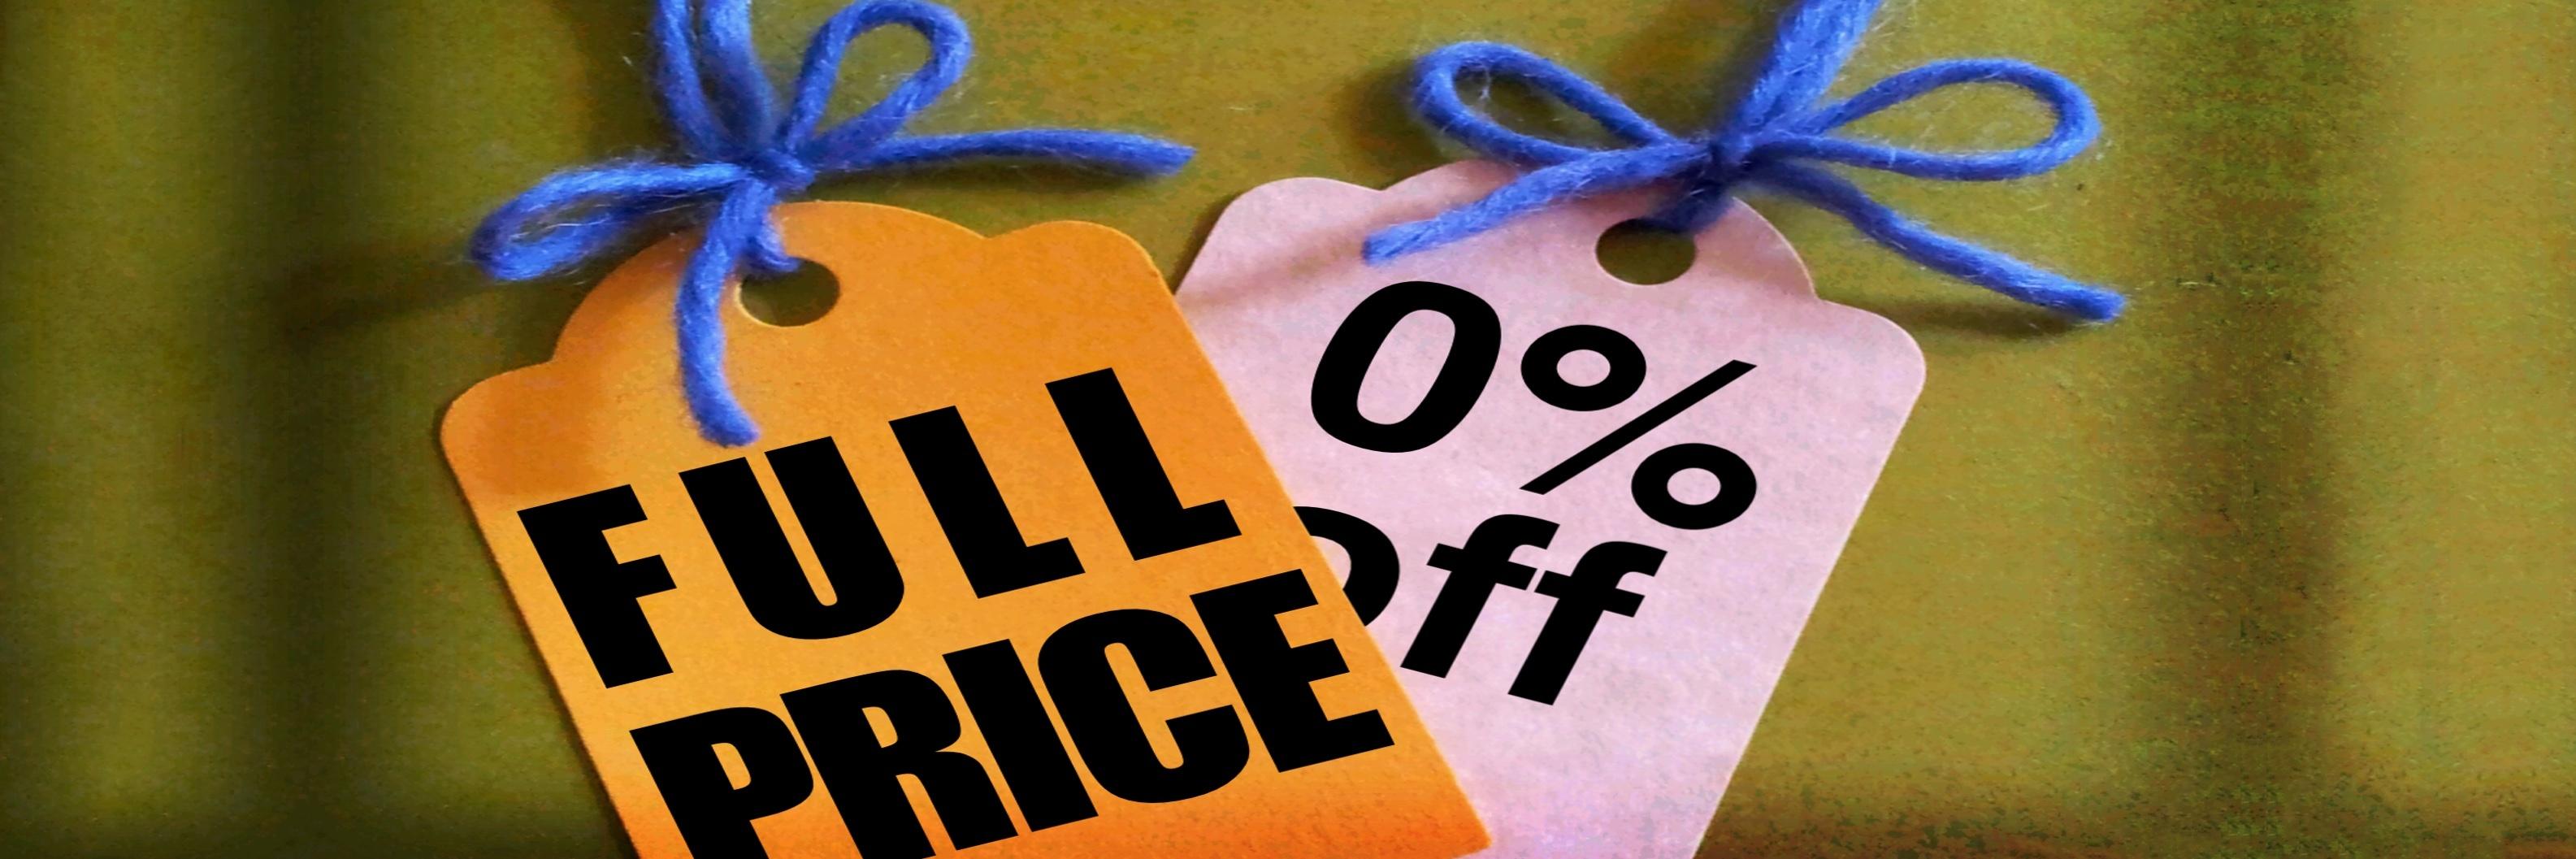 4 Foolproof Discount Pricing Strategies